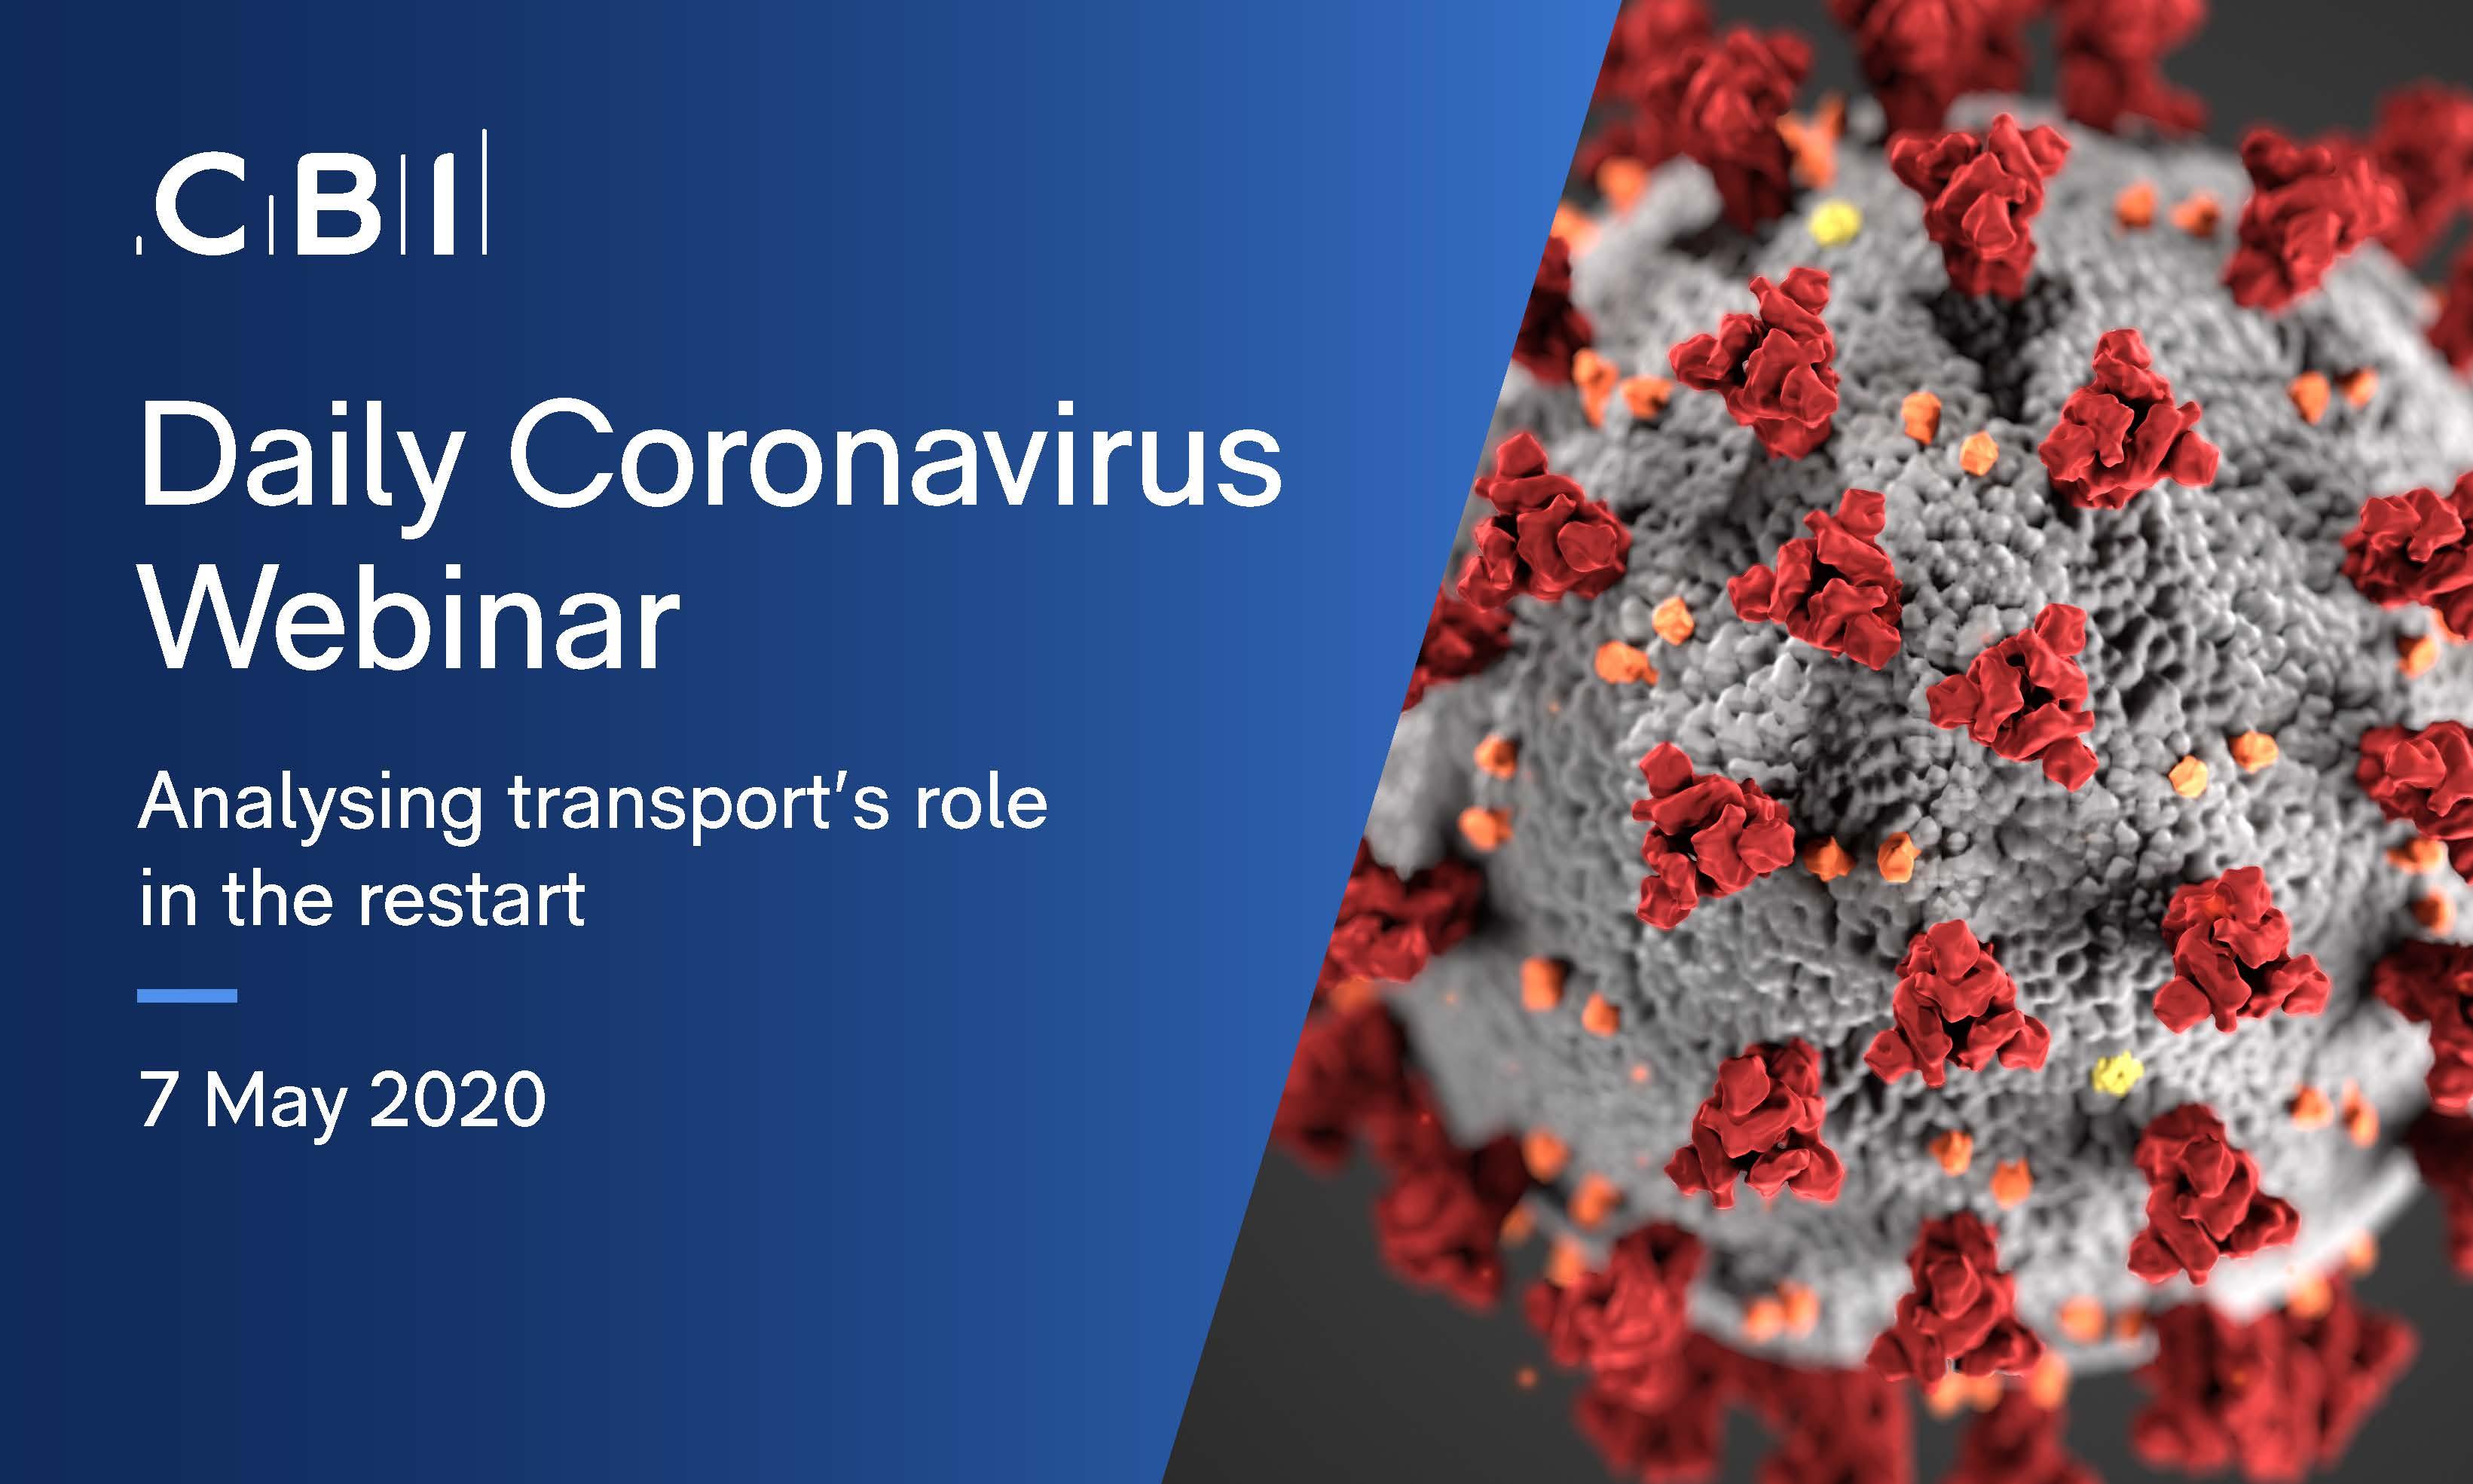 Daily Coronavirus Webinar: Analysing transport's role in the restart